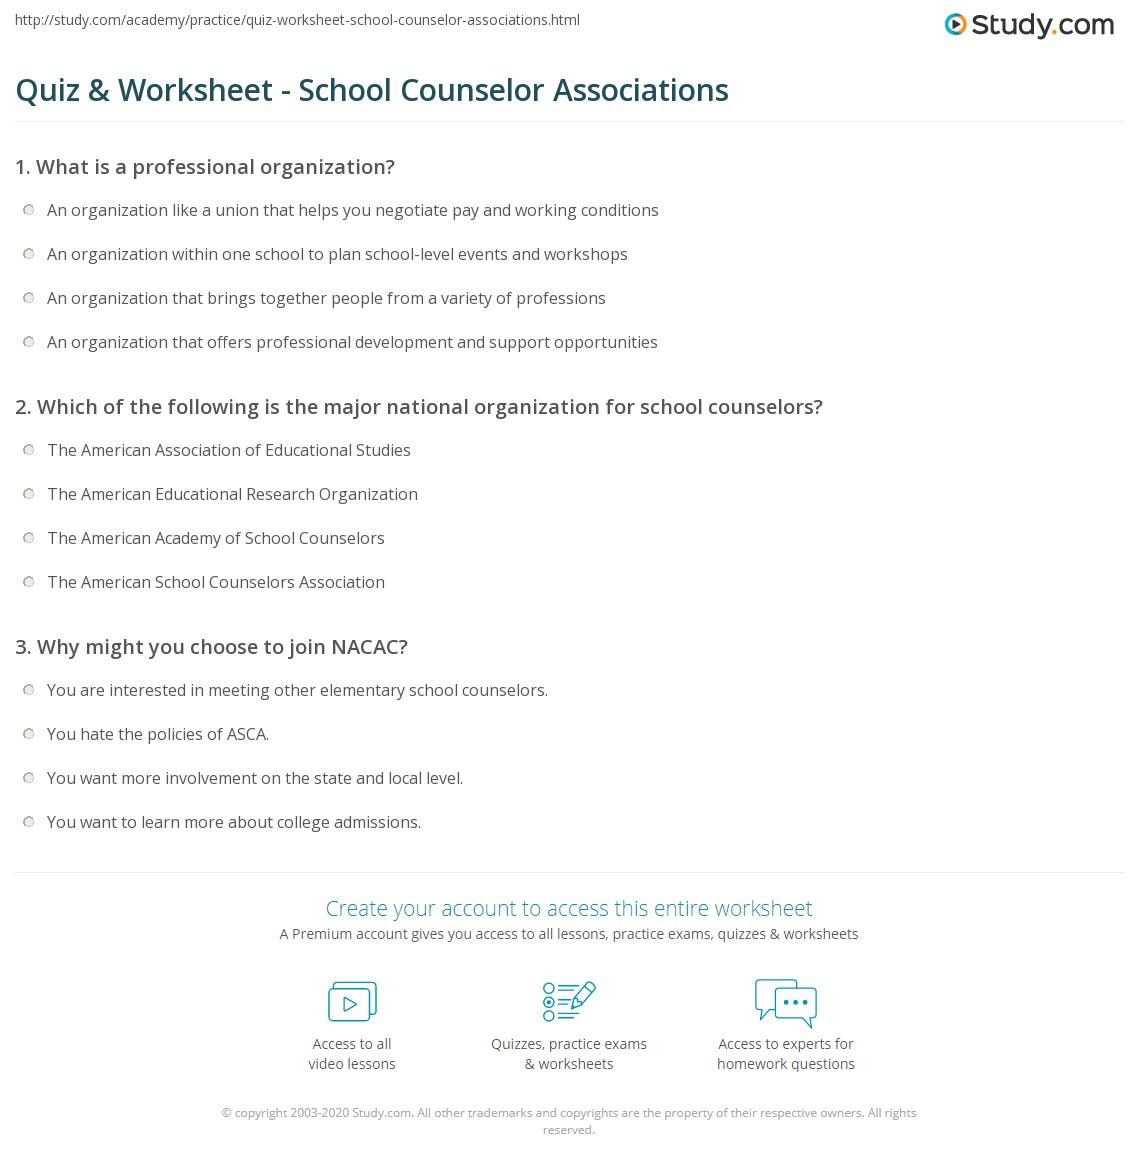 quiz worksheet school counselor associations com print professional organizations for school counselors worksheet